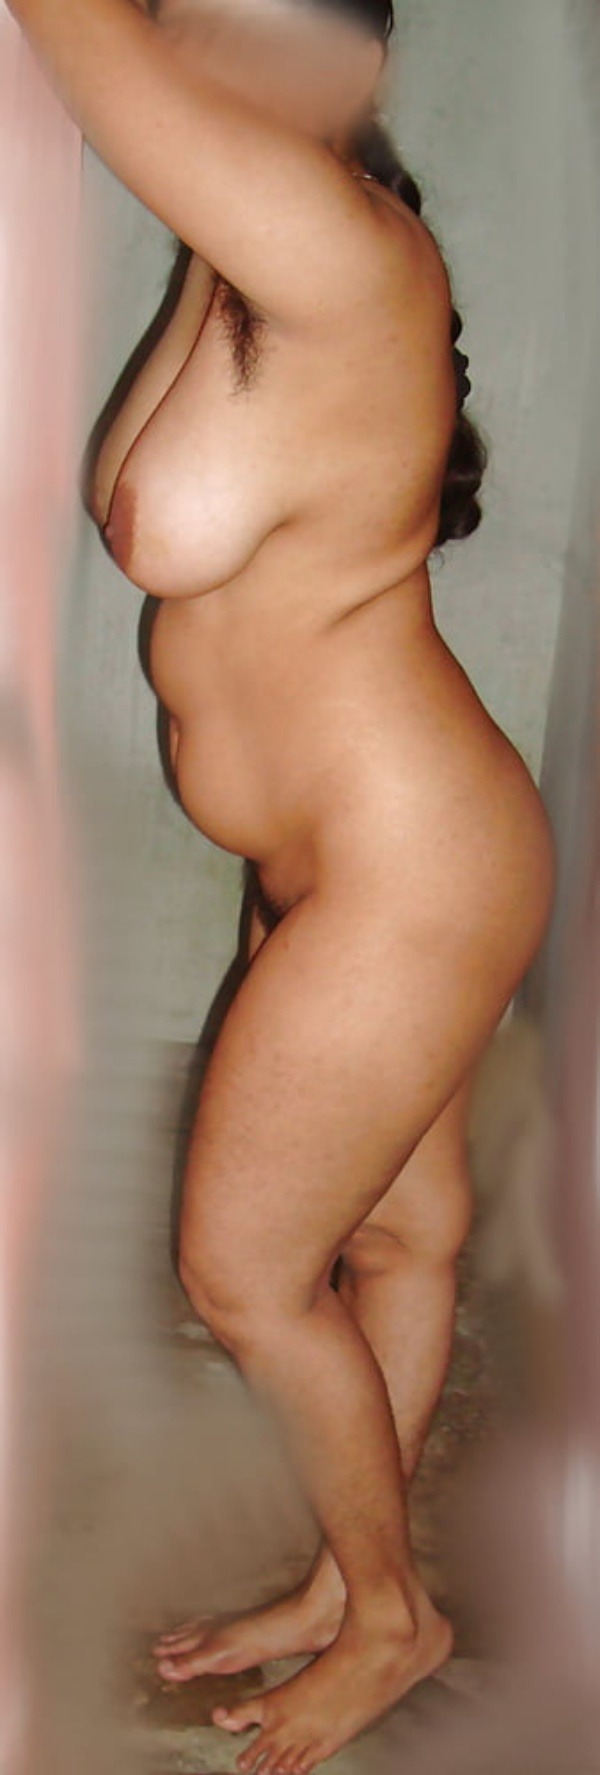 provocative sexy desi aunty nude pics - 15